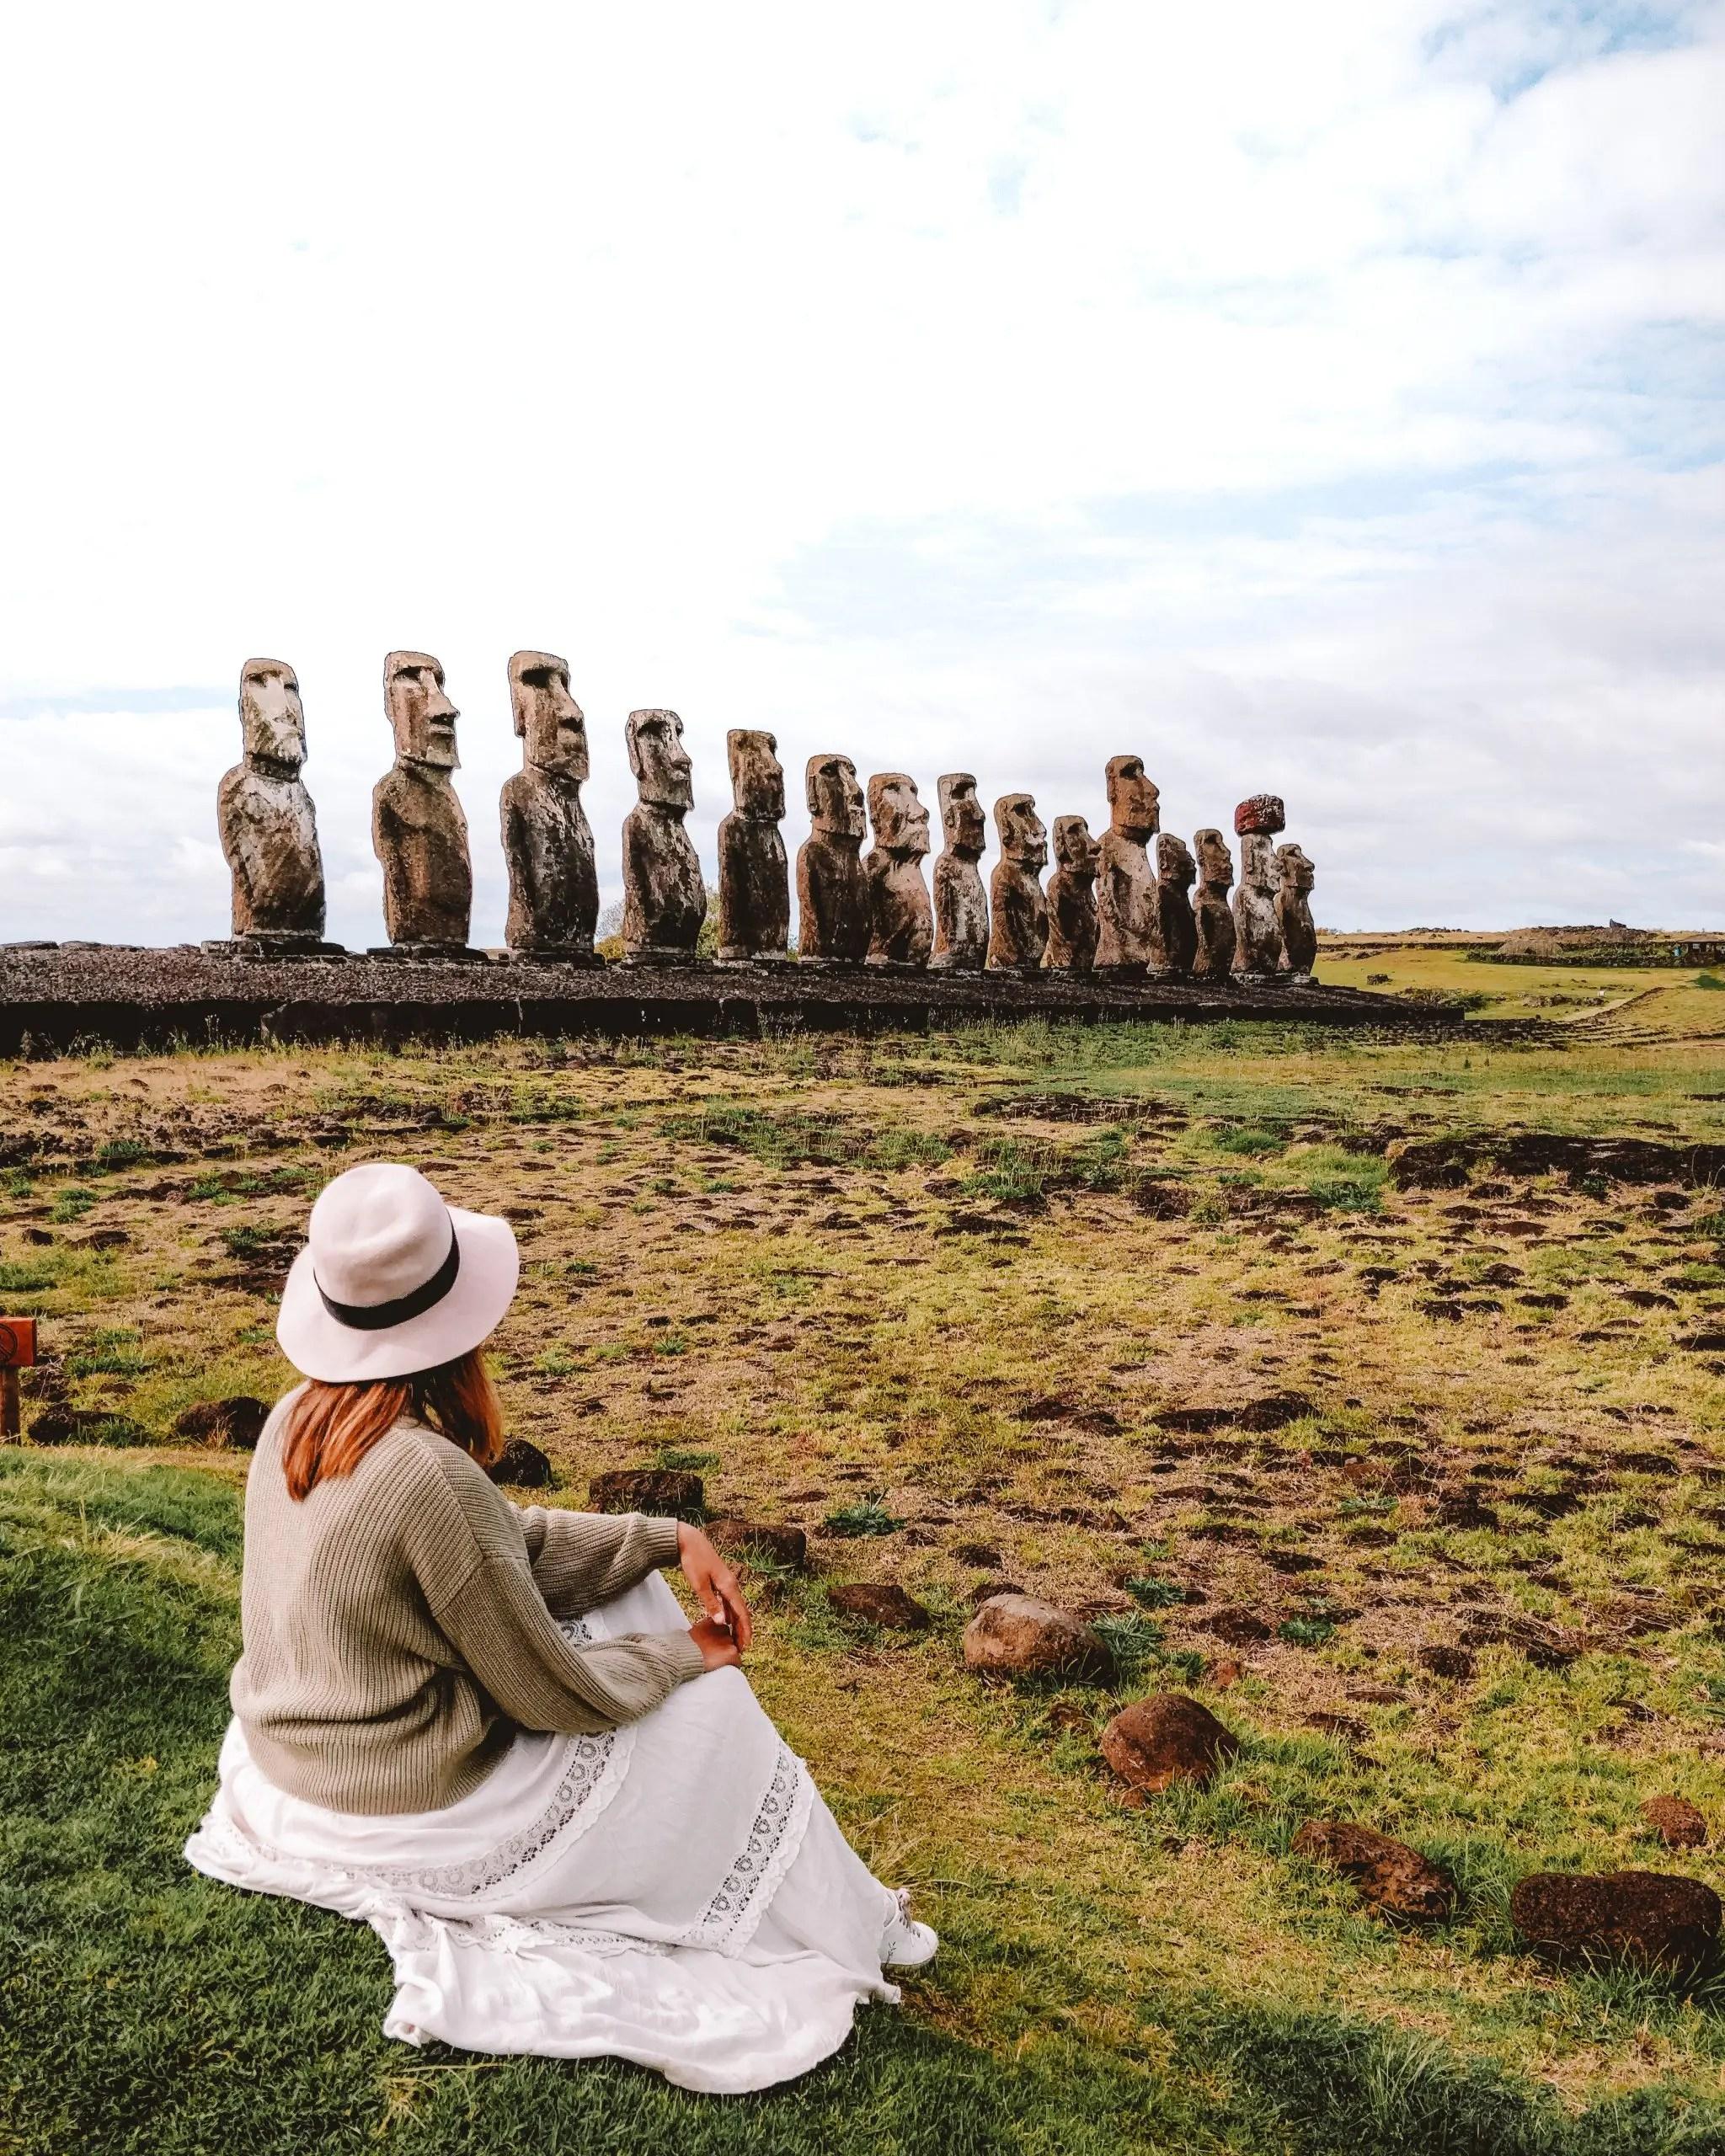 Ahu Tongariki, the largest platform of Moai statues on Easter Island.